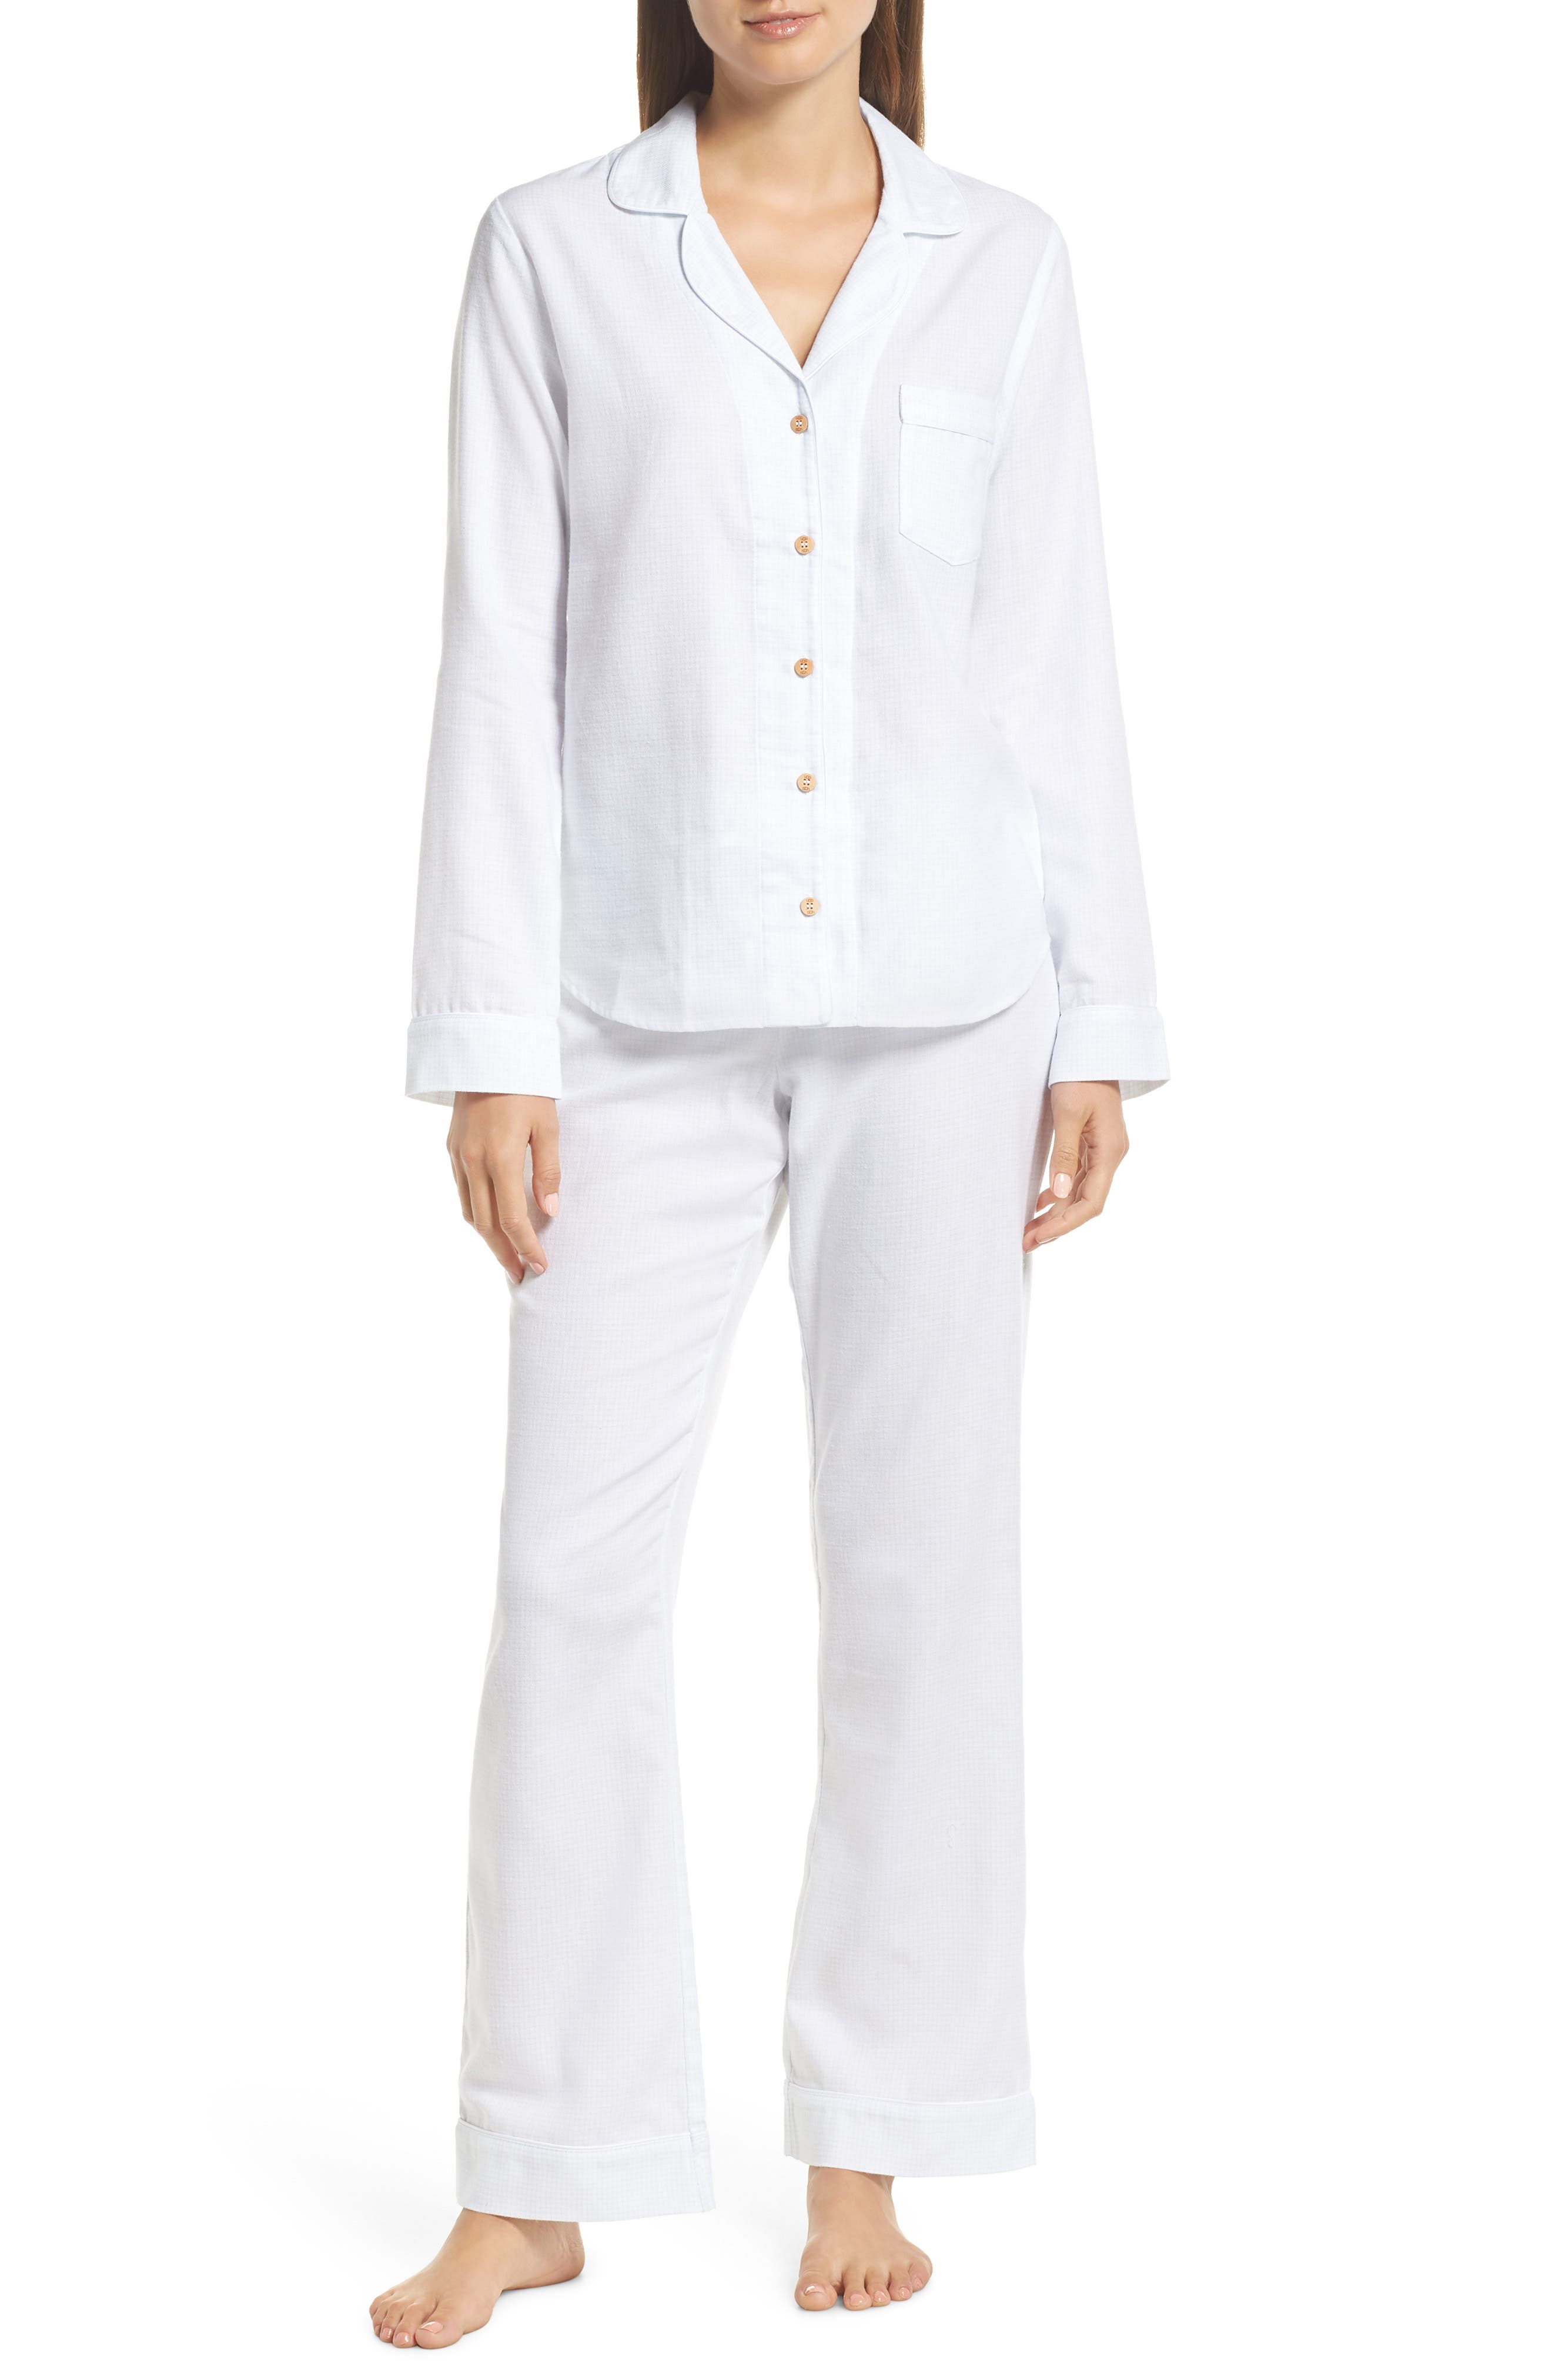 Raven Plaid Pajamas,                         Main,                         color, WHITE / SKY BLUE CHECK